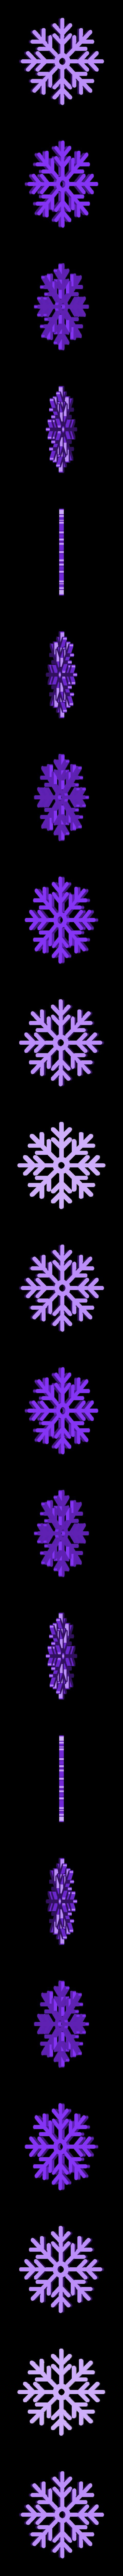 DiY_Christmas_Tree_-_Branch_4_CSD.stl Download free STL file Christmas Tree - DiY (printable) • Object to 3D print, CSD_Salzburg